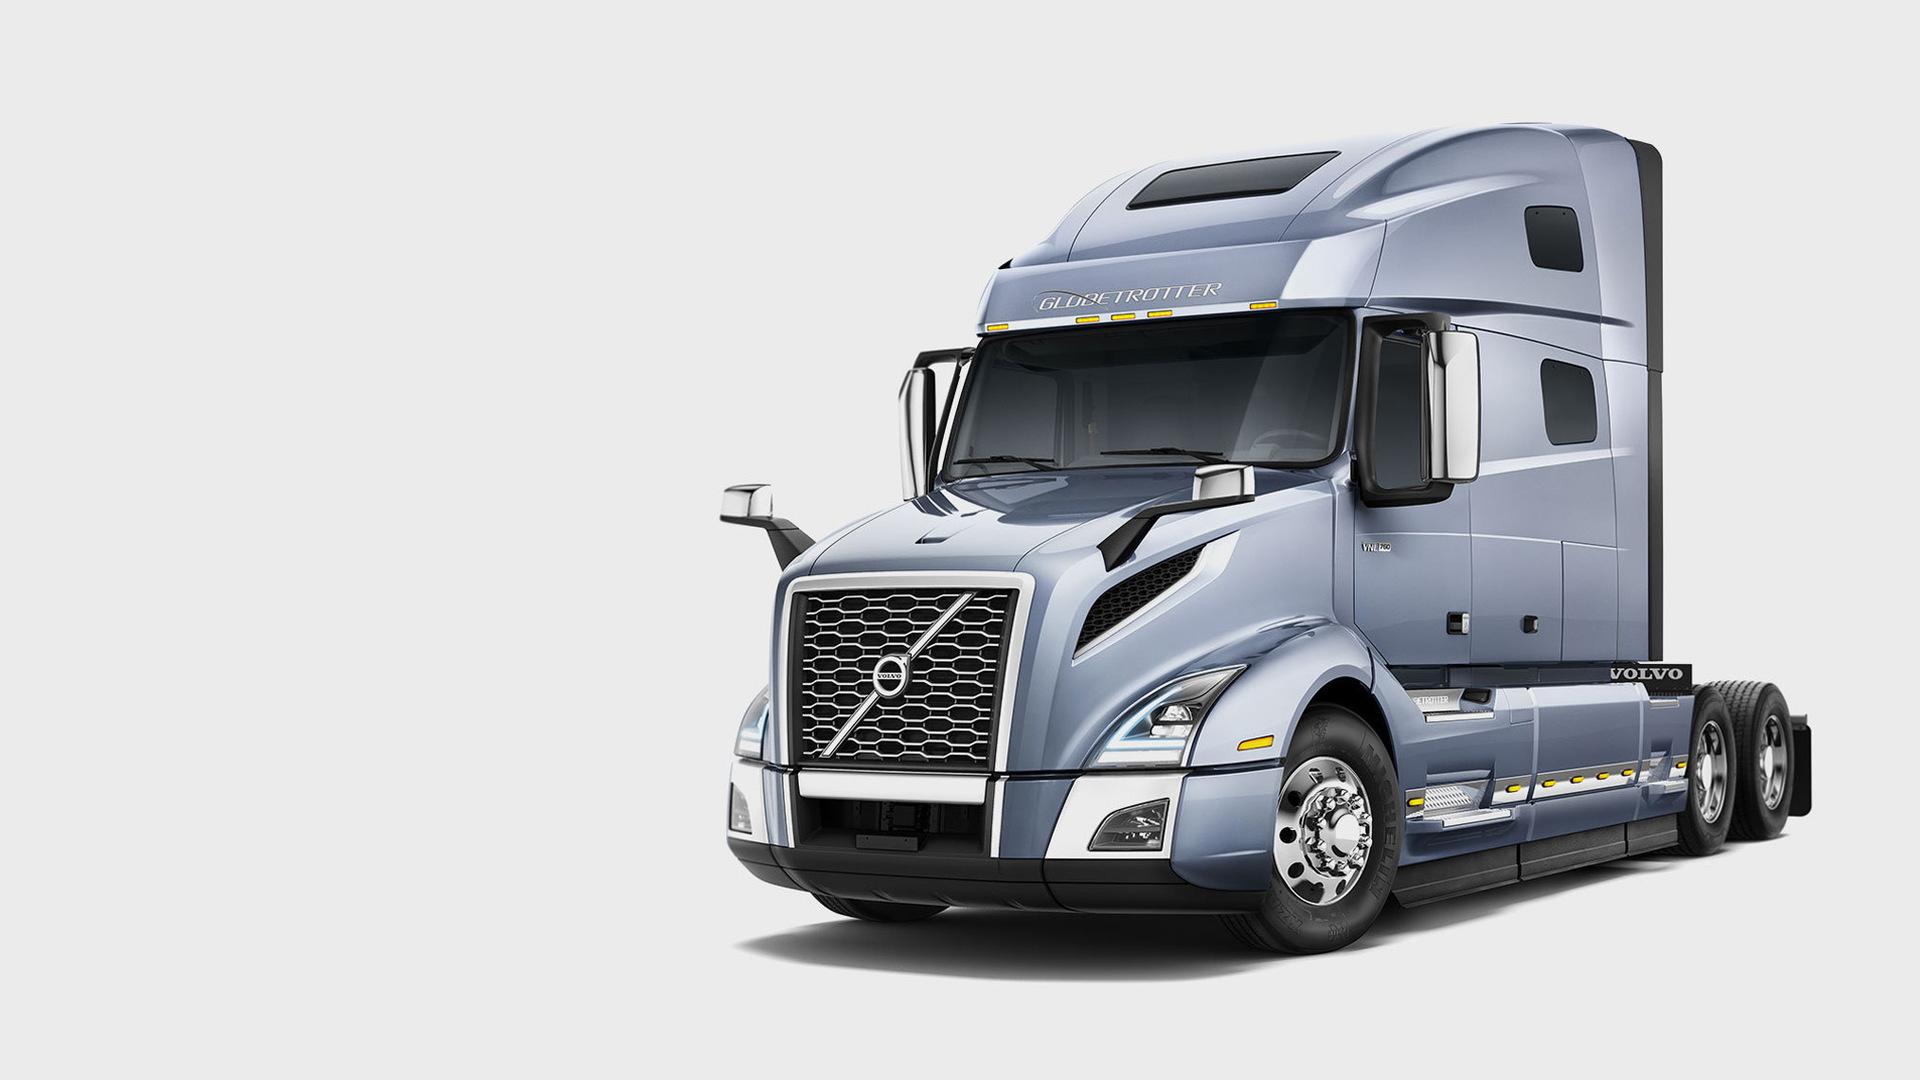 Volvo VNL-series semi-trailer truck